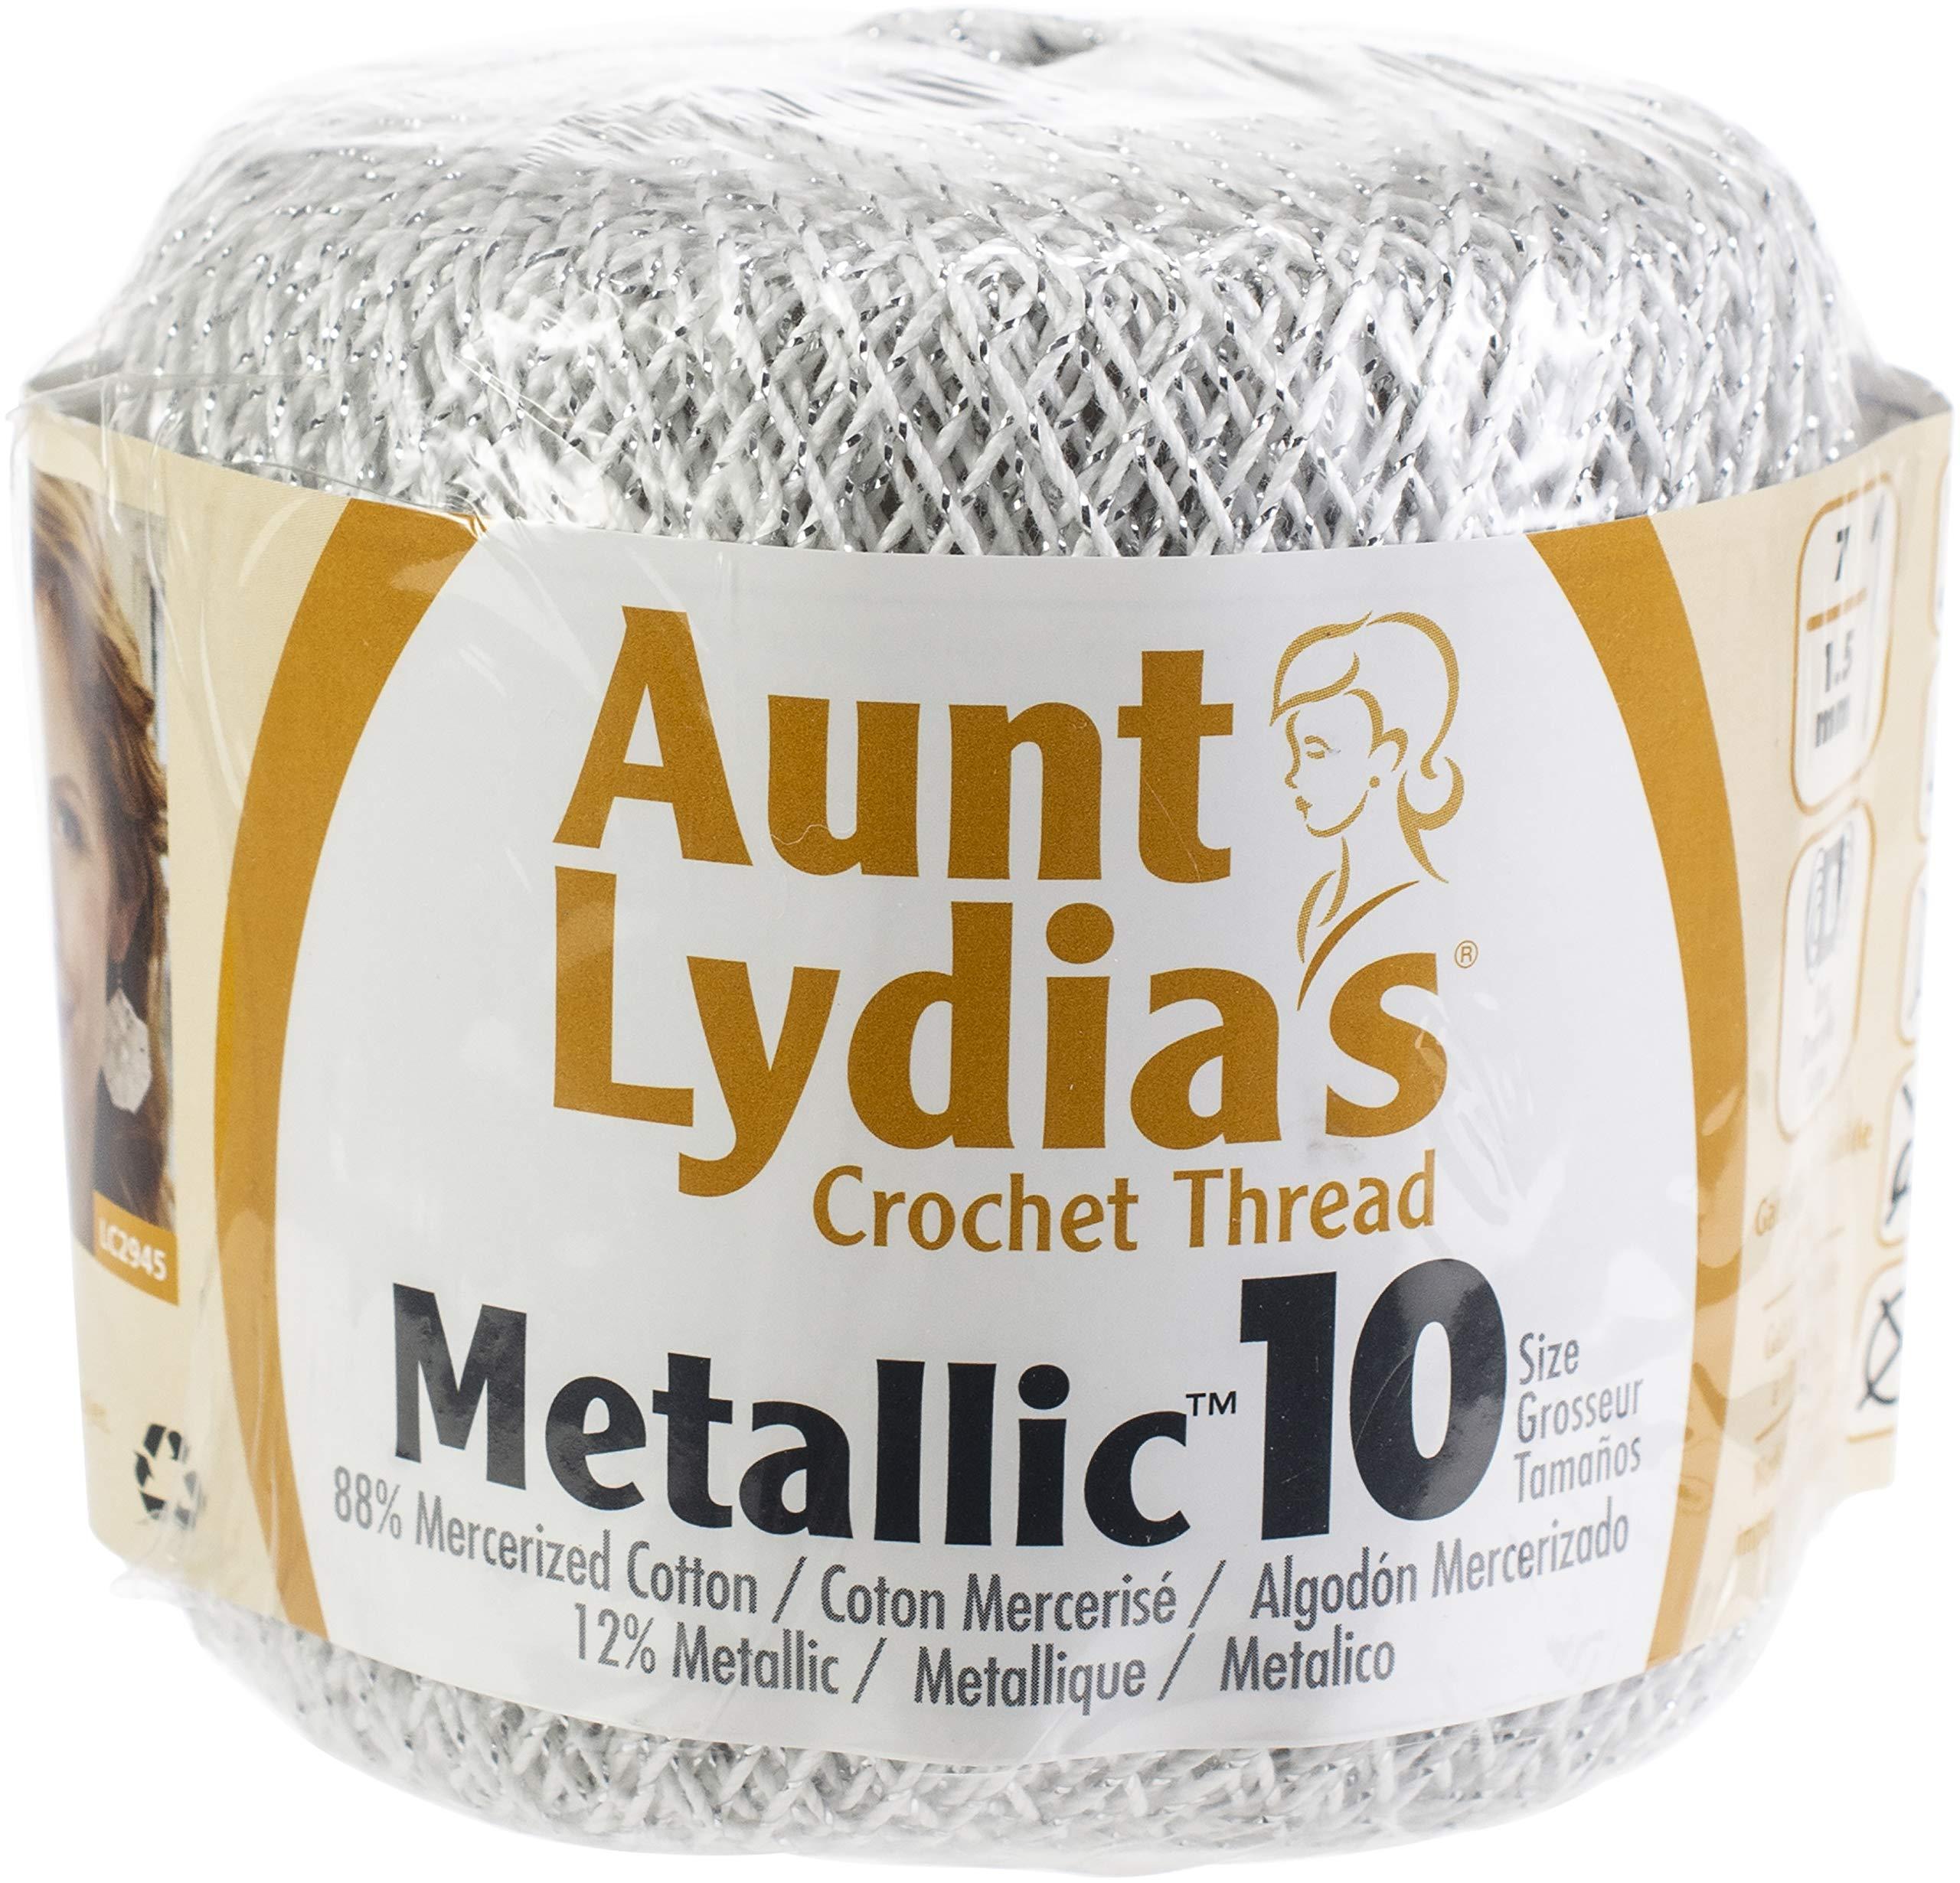 Aunt Lydia's 96891 Metallic Crochet Thread Size 10 12/Pk-White & Silver, Pack